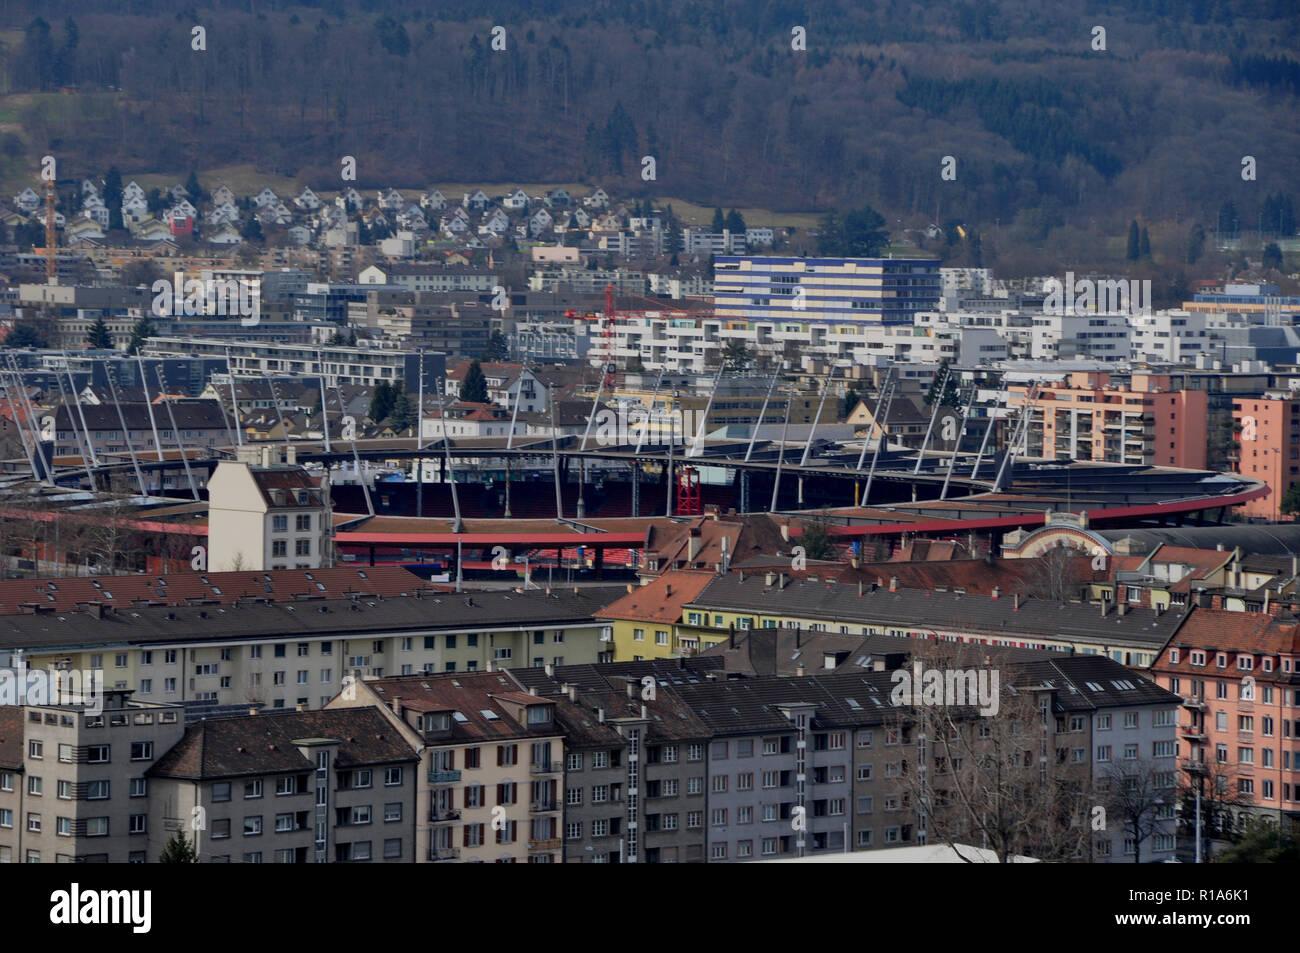 Switzerland: View from Prime Tower to the Letzigrund-Sportstadion in Zürich - Stock Image